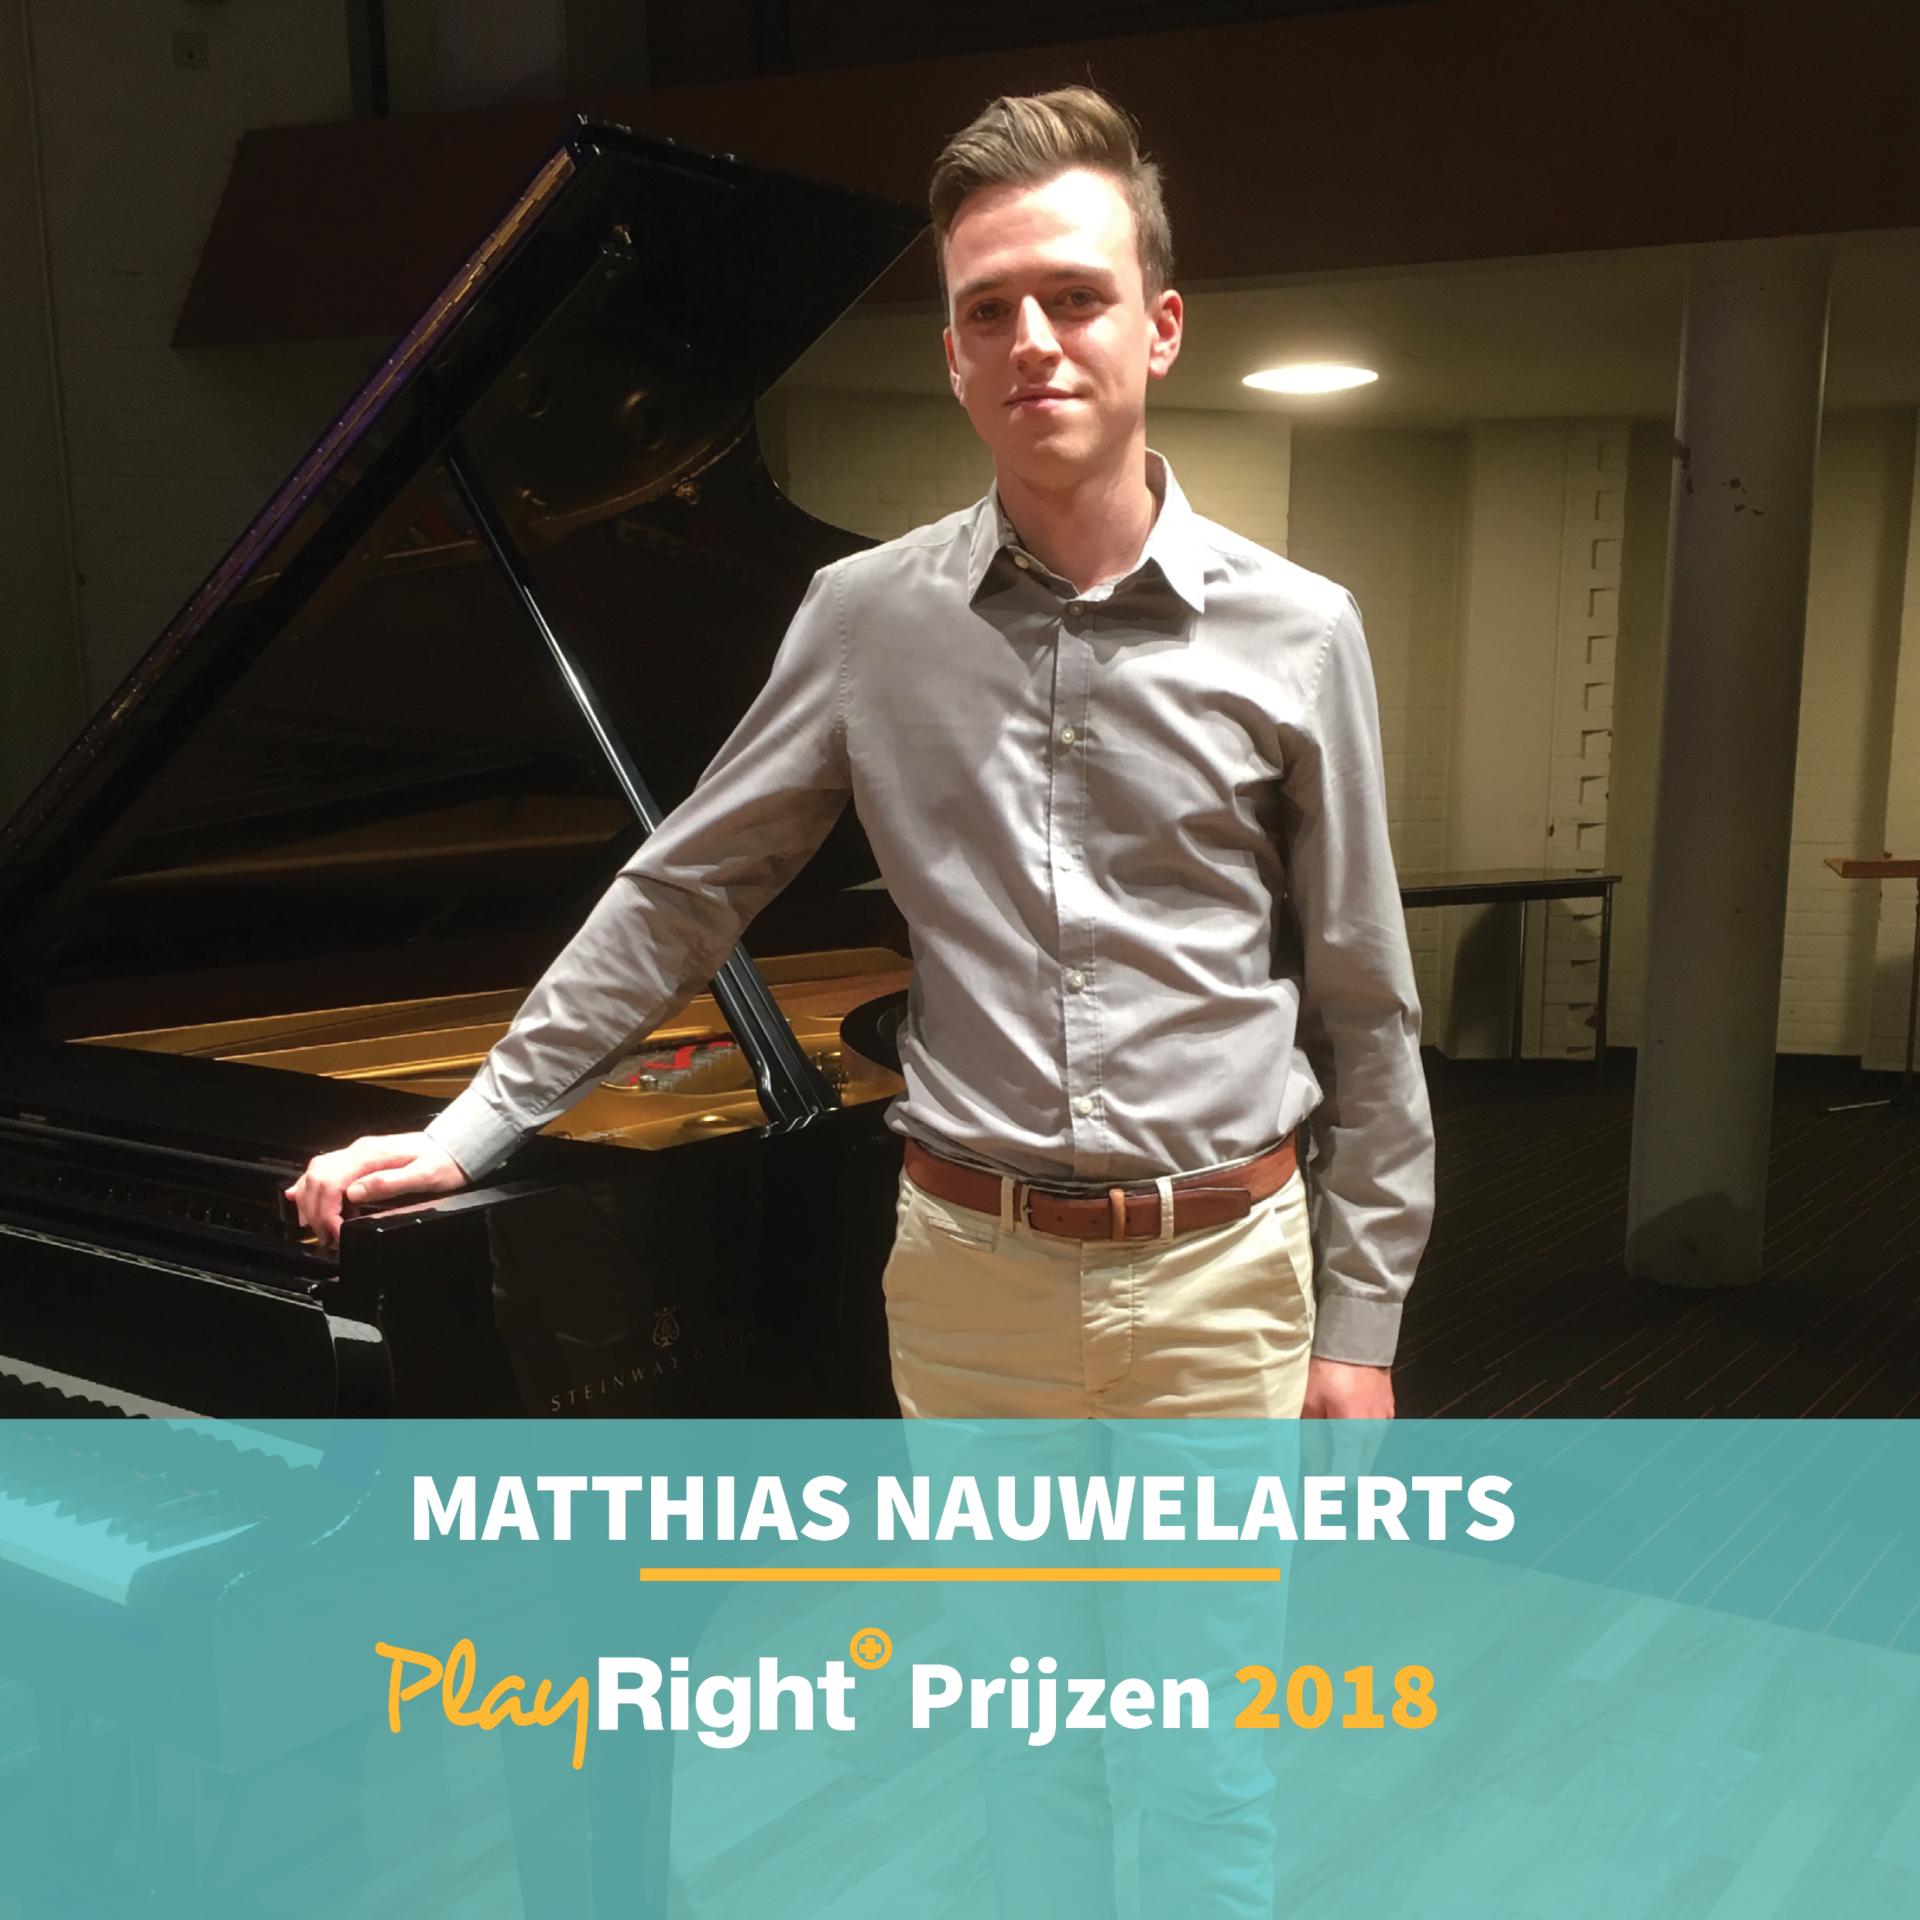 Matthias Nauwelaerts